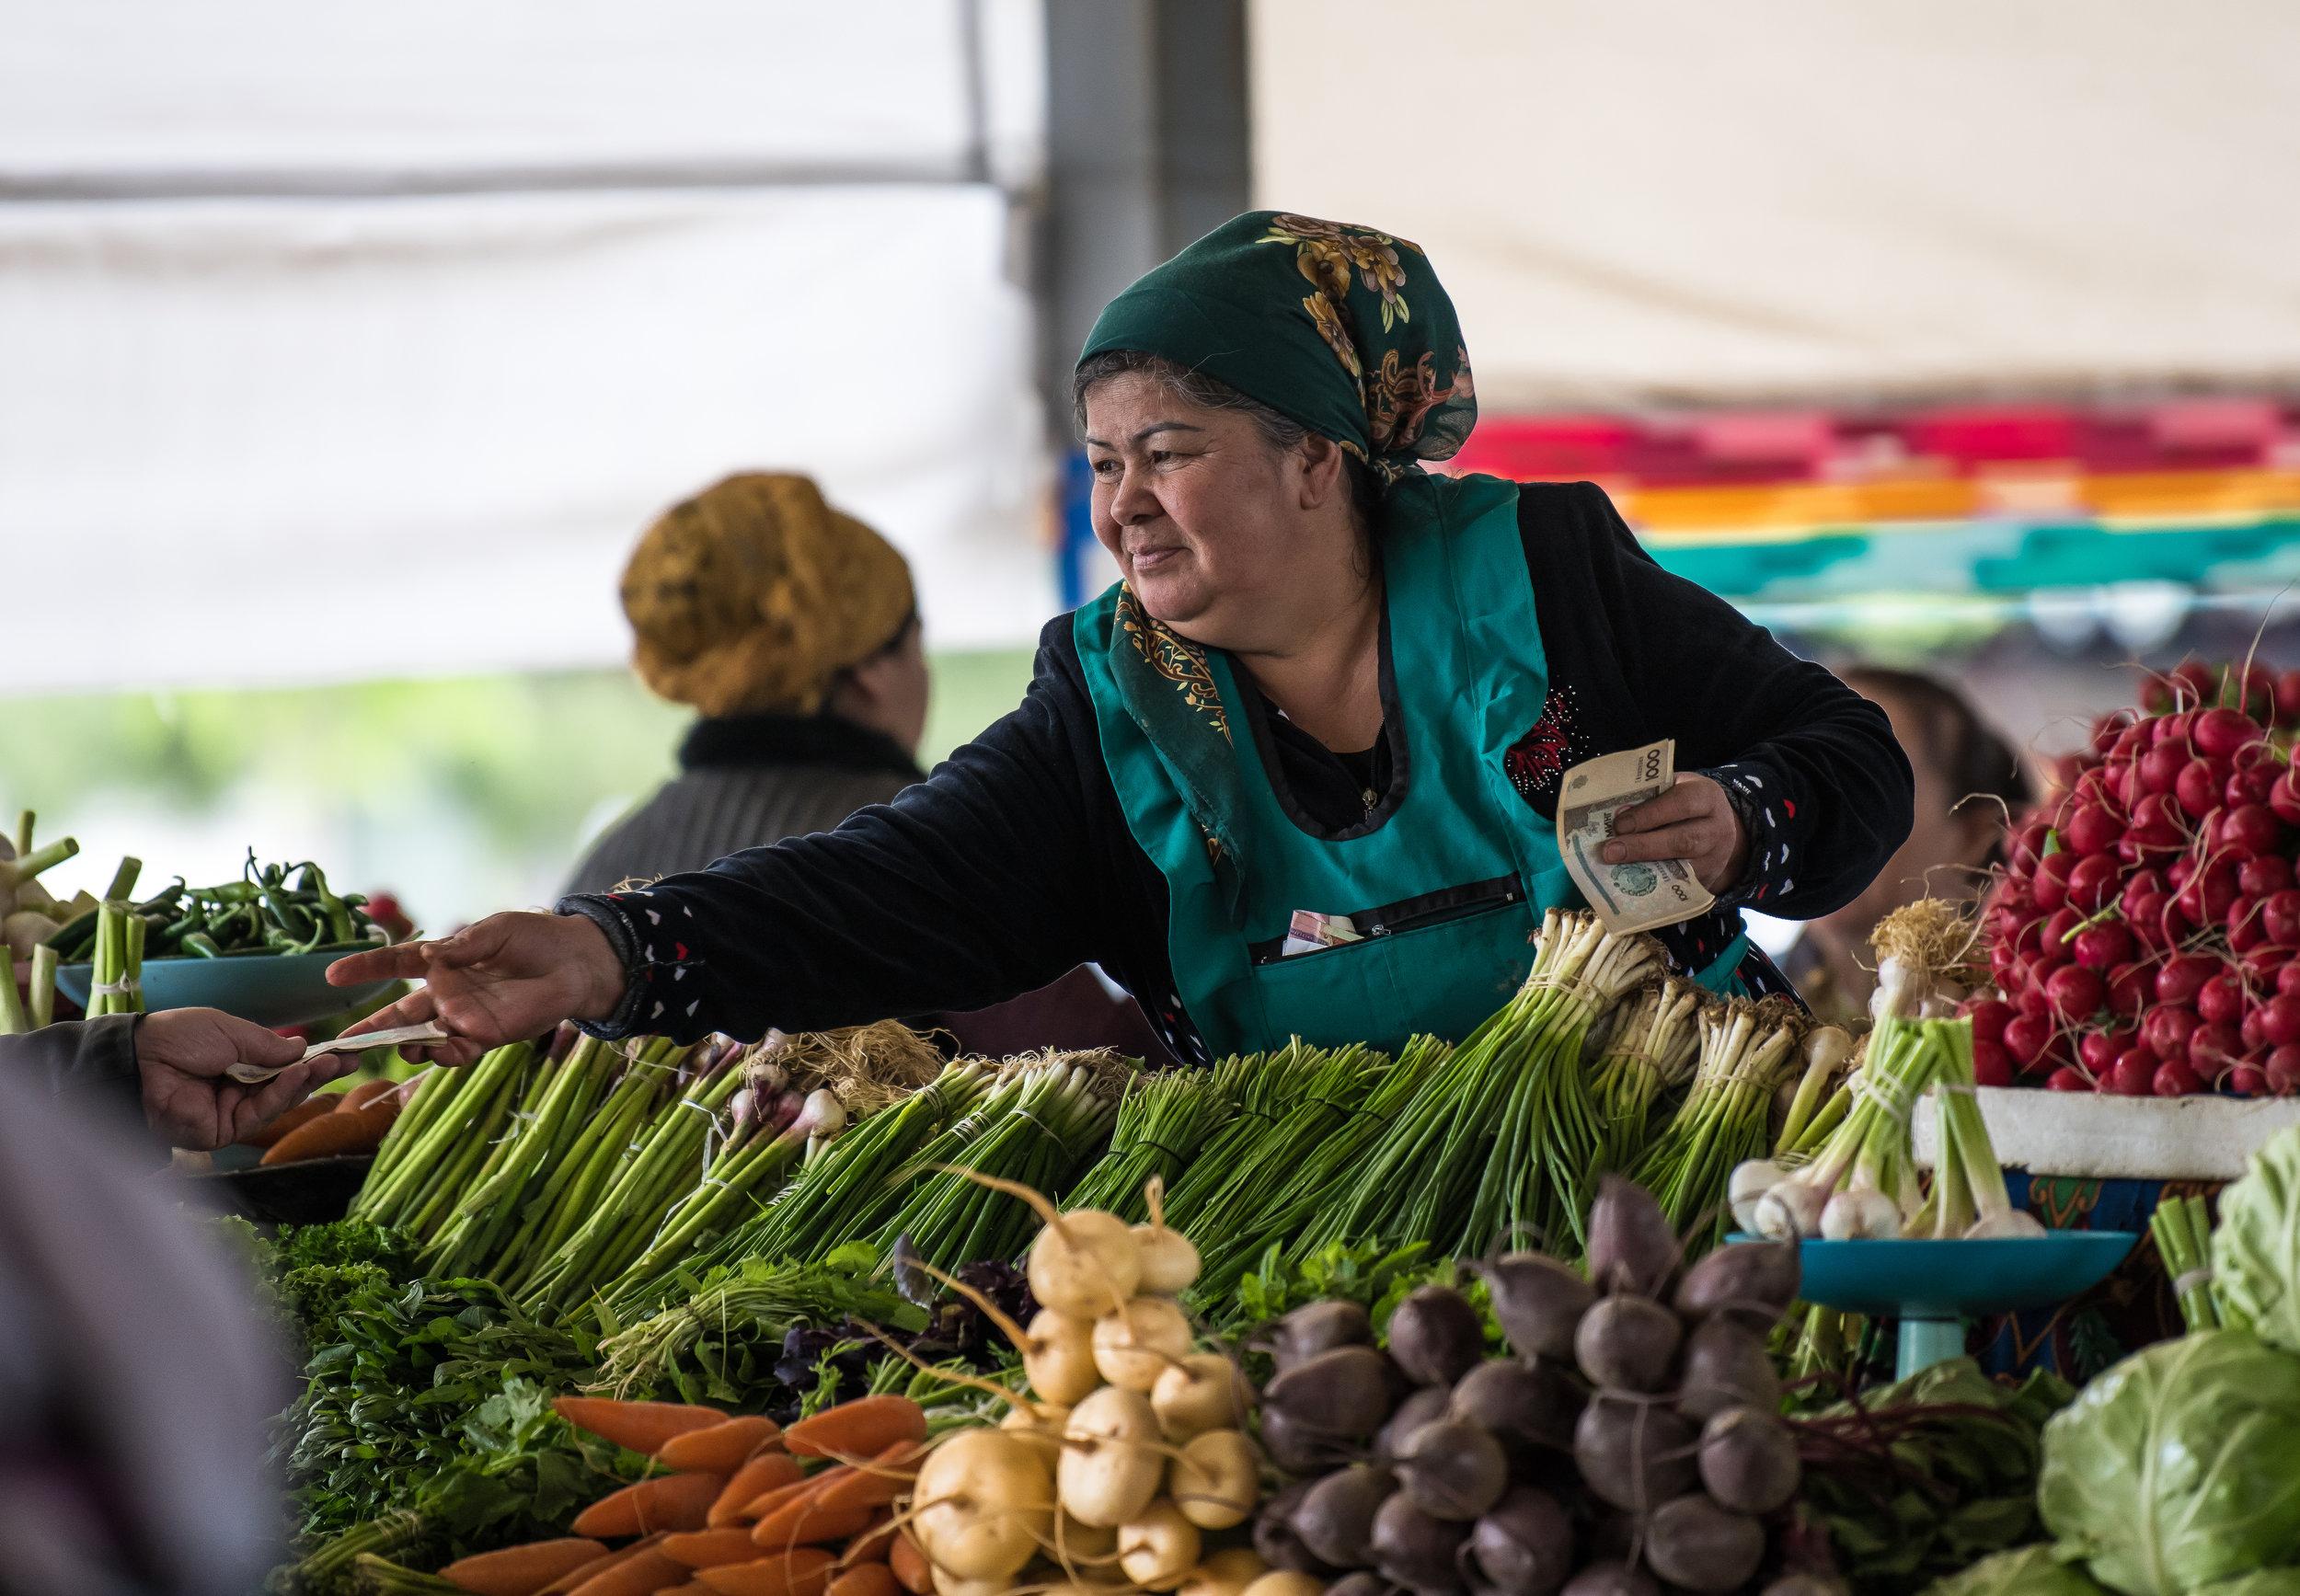 Tashkent-8766.jpg